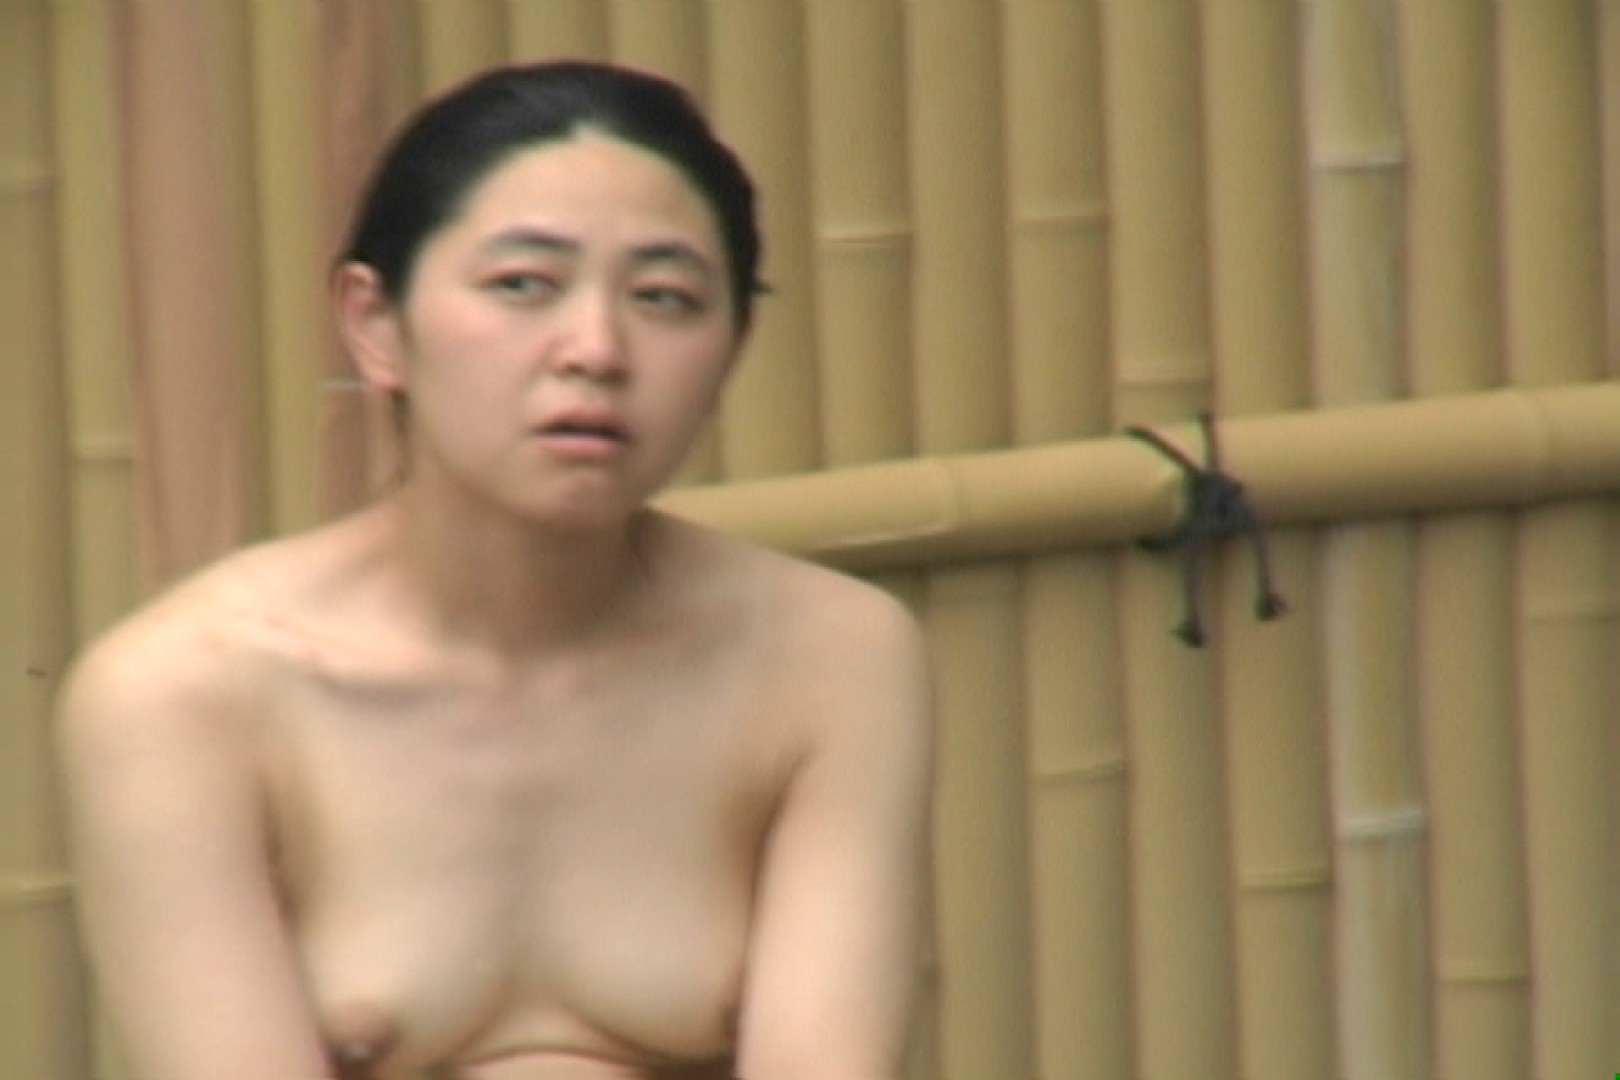 Aquaな露天風呂Vol.623 盗撮 SEX無修正画像 97画像 2